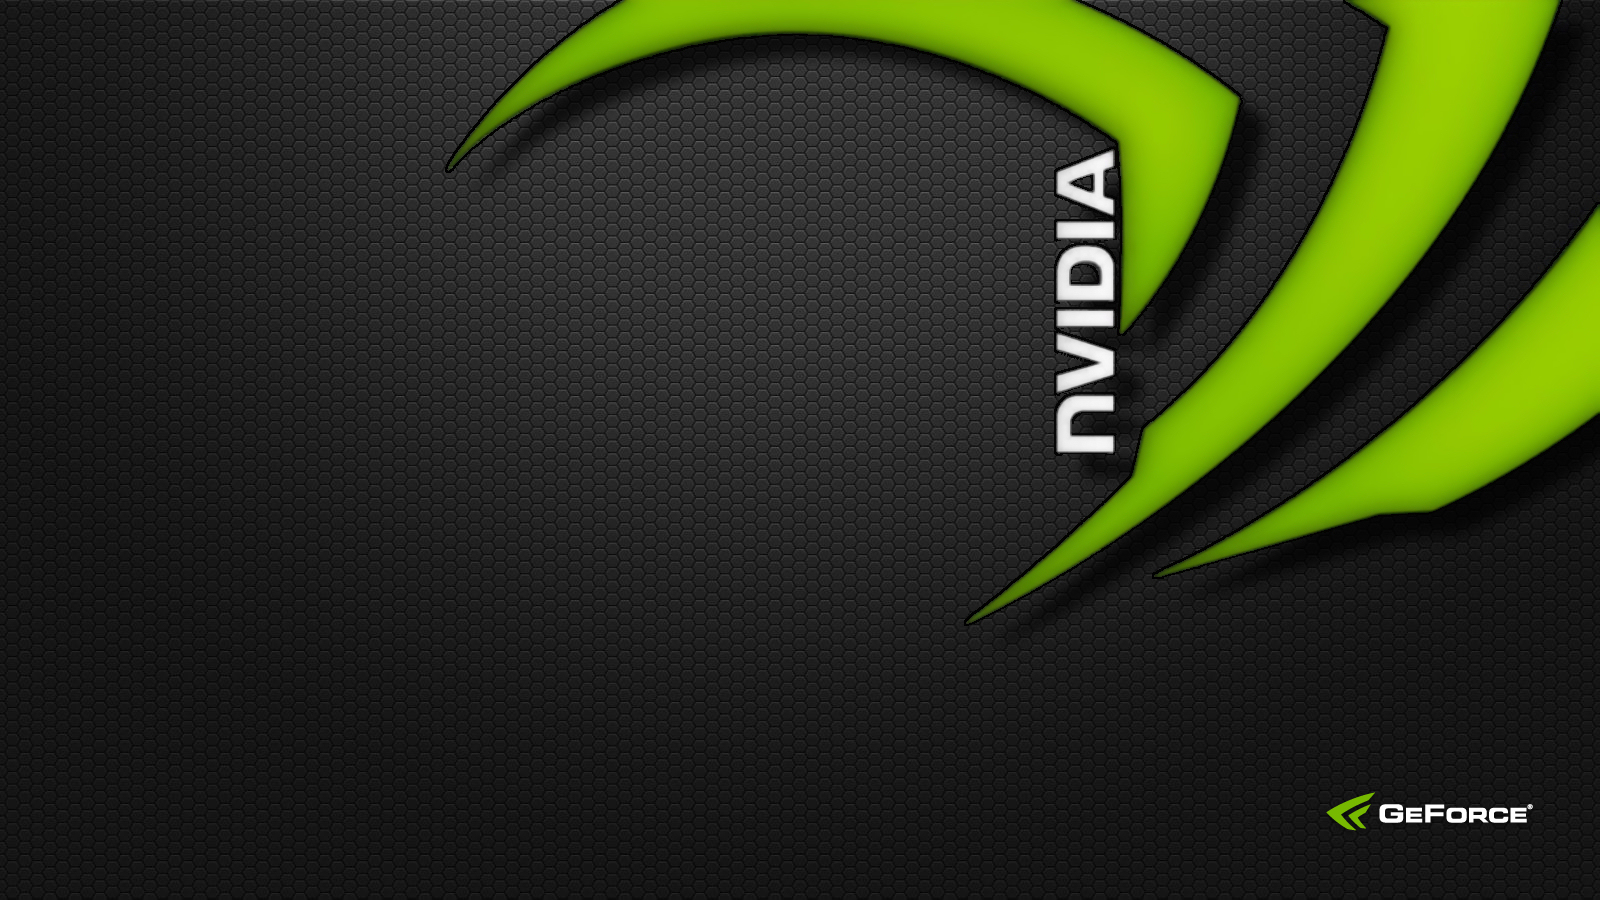 46 nvidia wallpaper 1920x1080 hd on wallpapersafari - 1920x1080 wallpaper nvidia ...